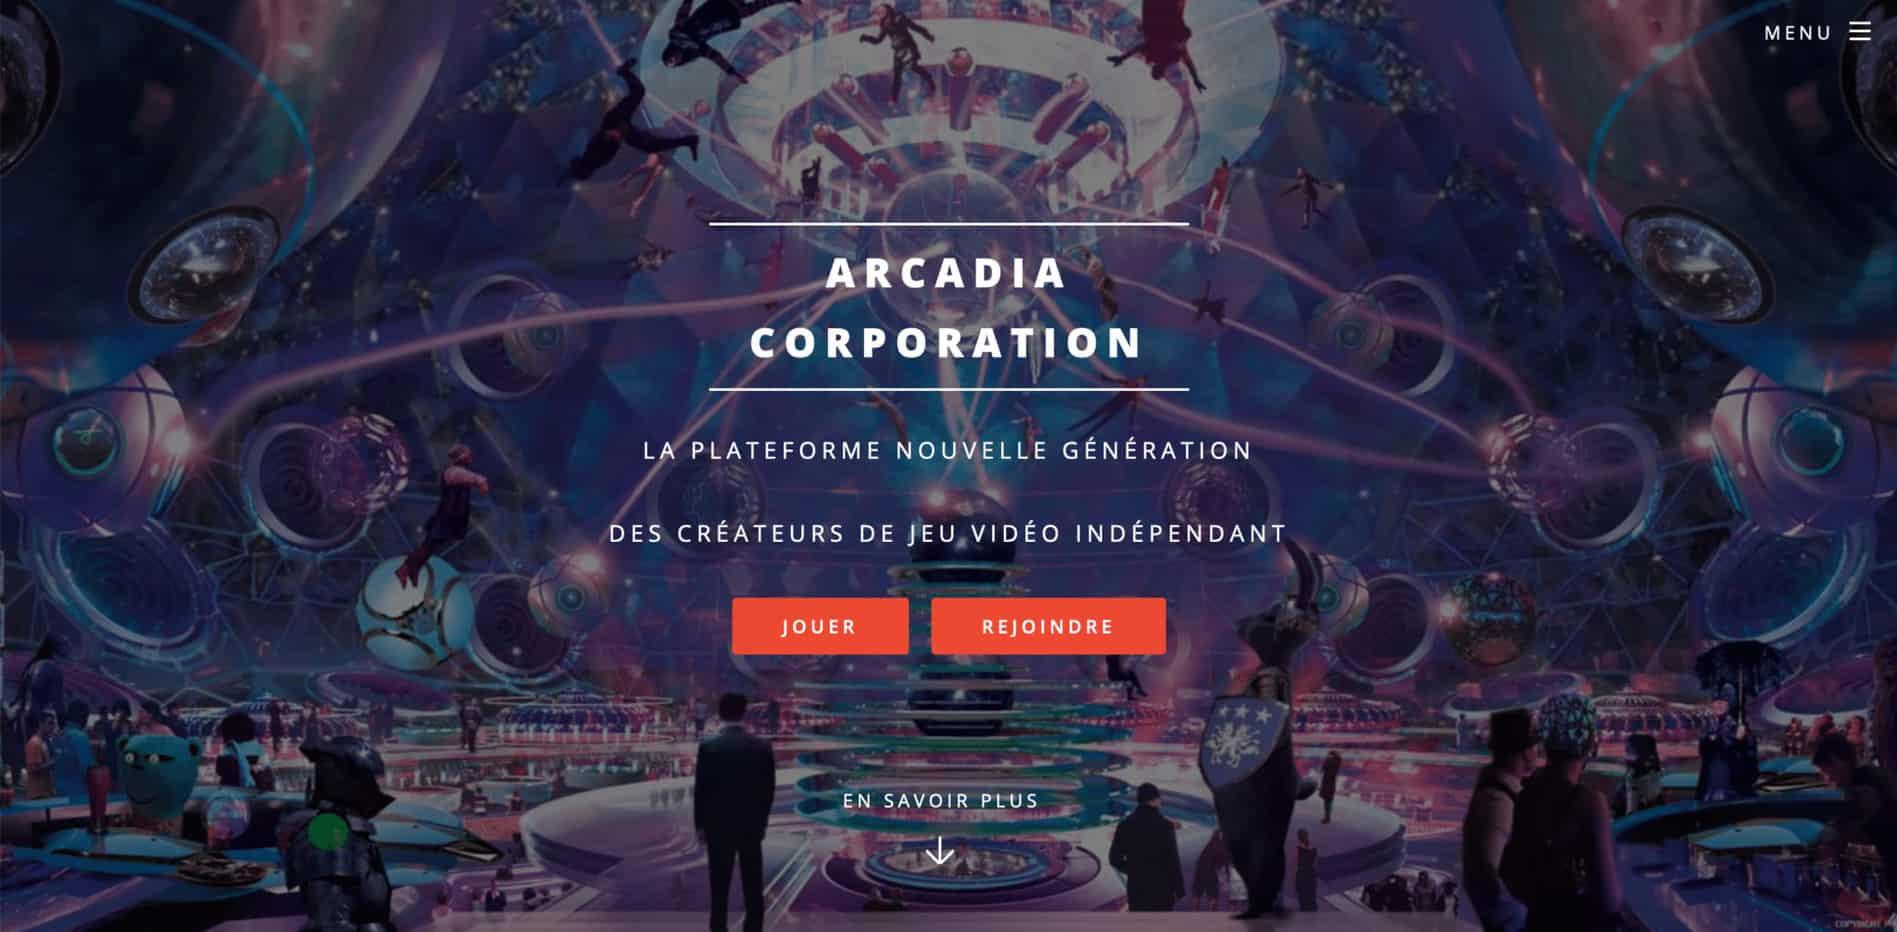 Arcadia Corporation